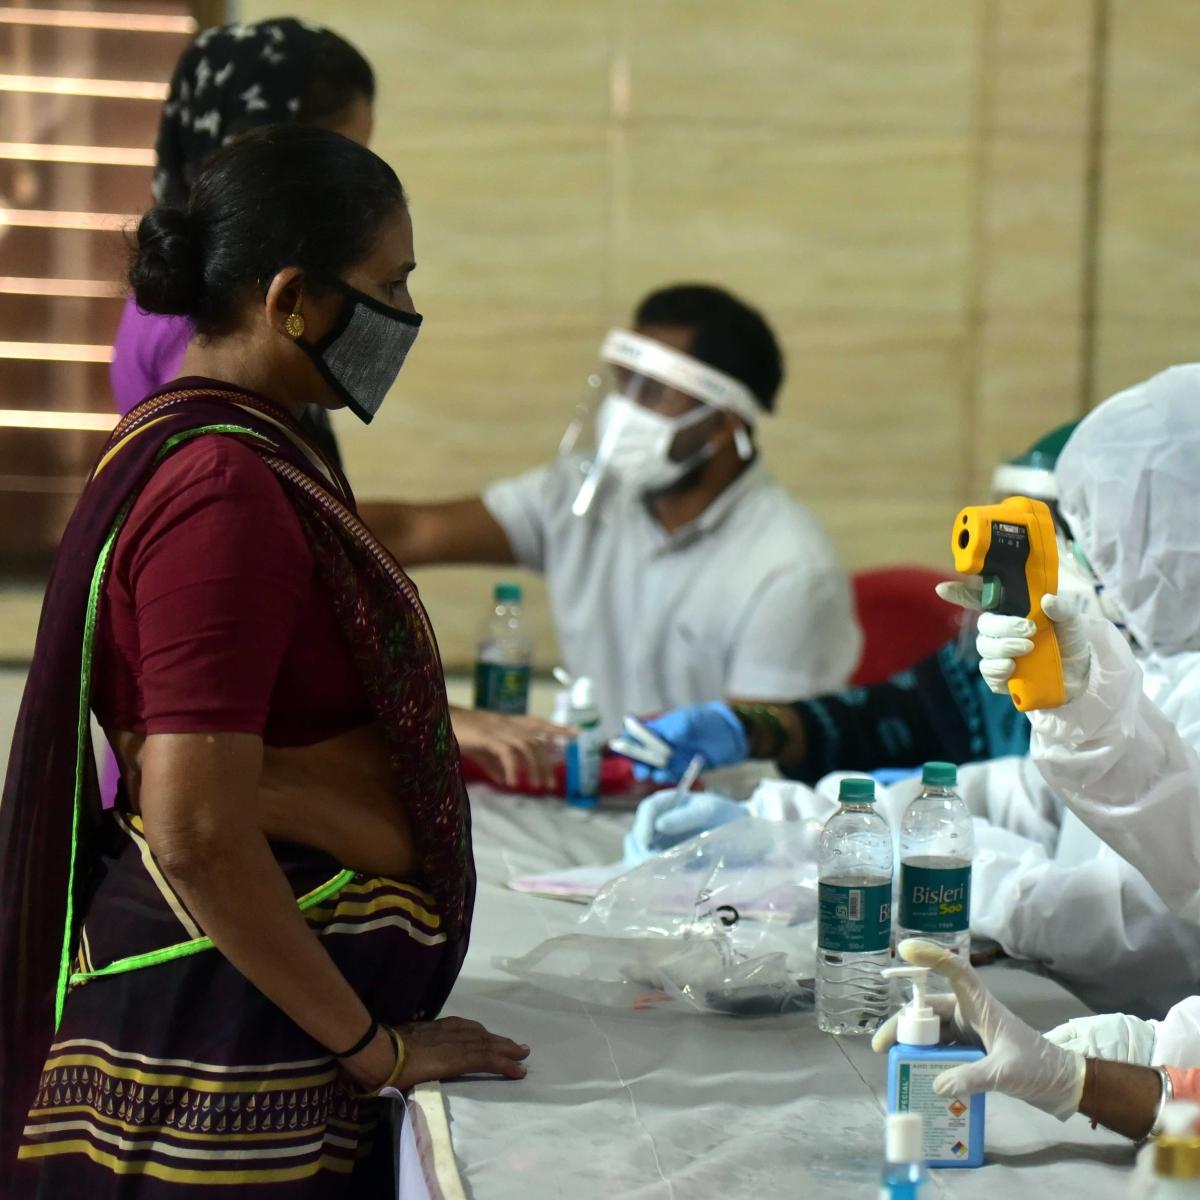 Coronavirus in Mumbai: Experts see 2nd less virulent peak in November and December